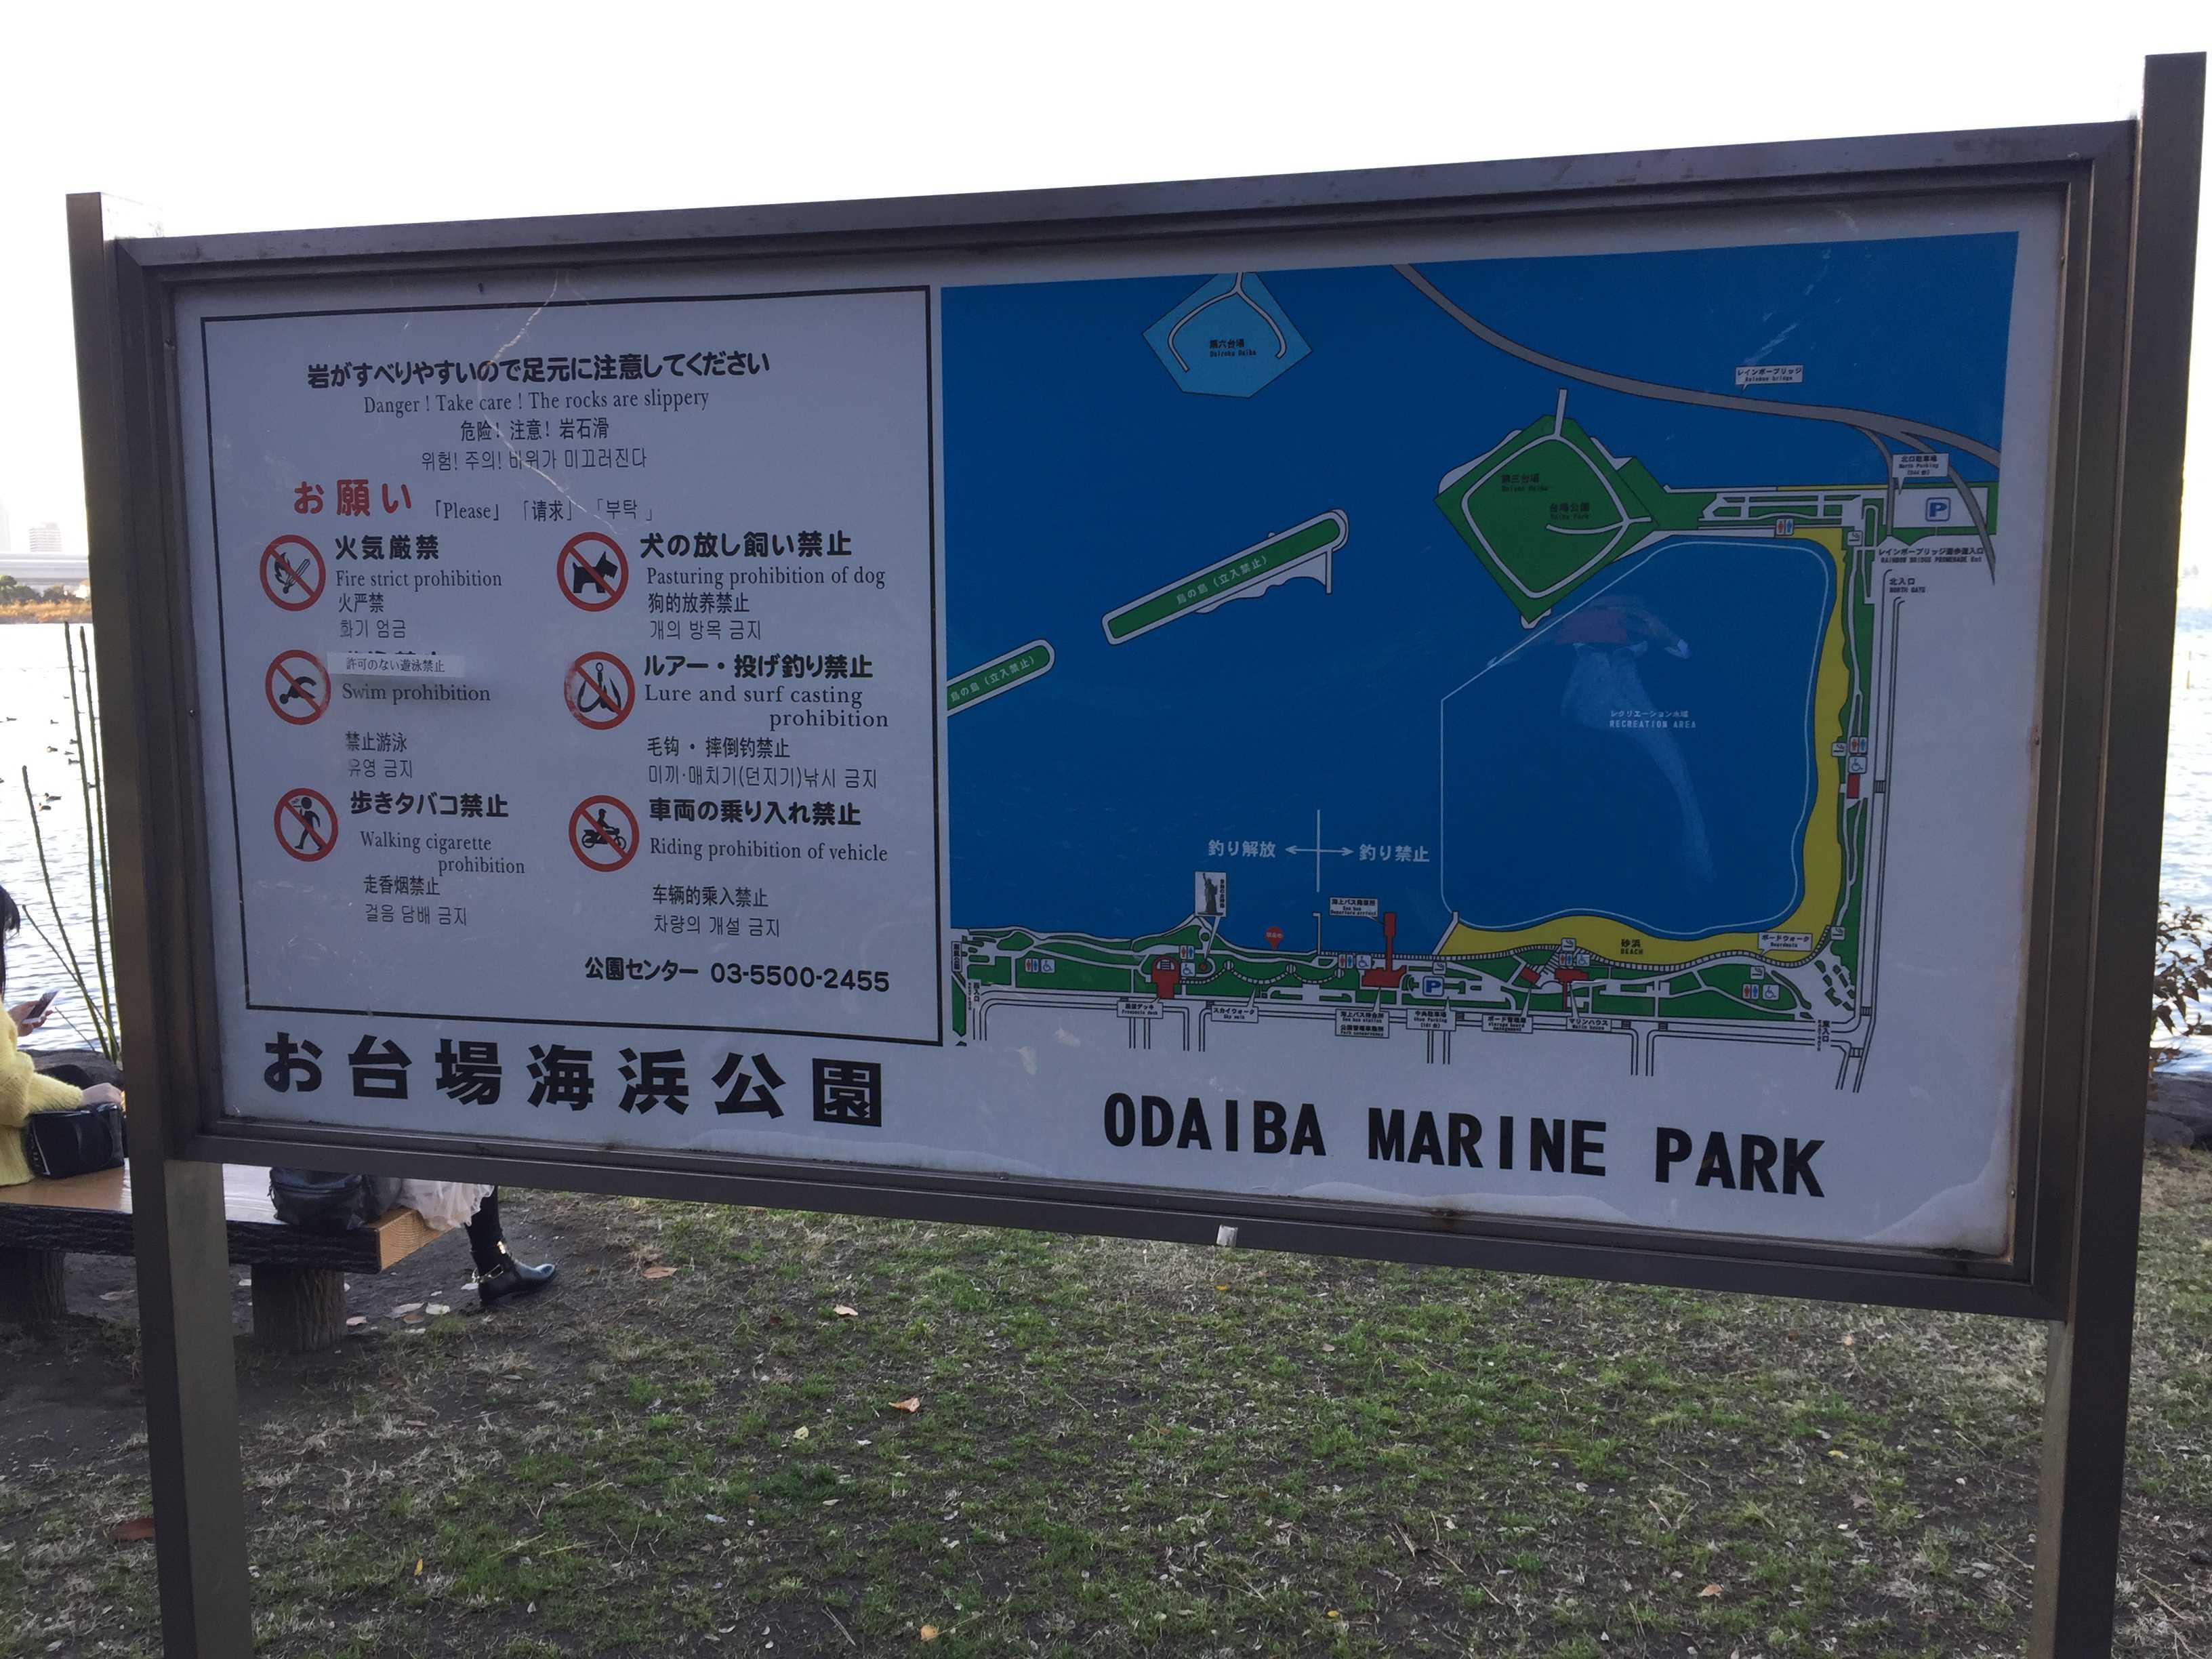 お台場海浜公園 (ODAIBA MARINE PARK)